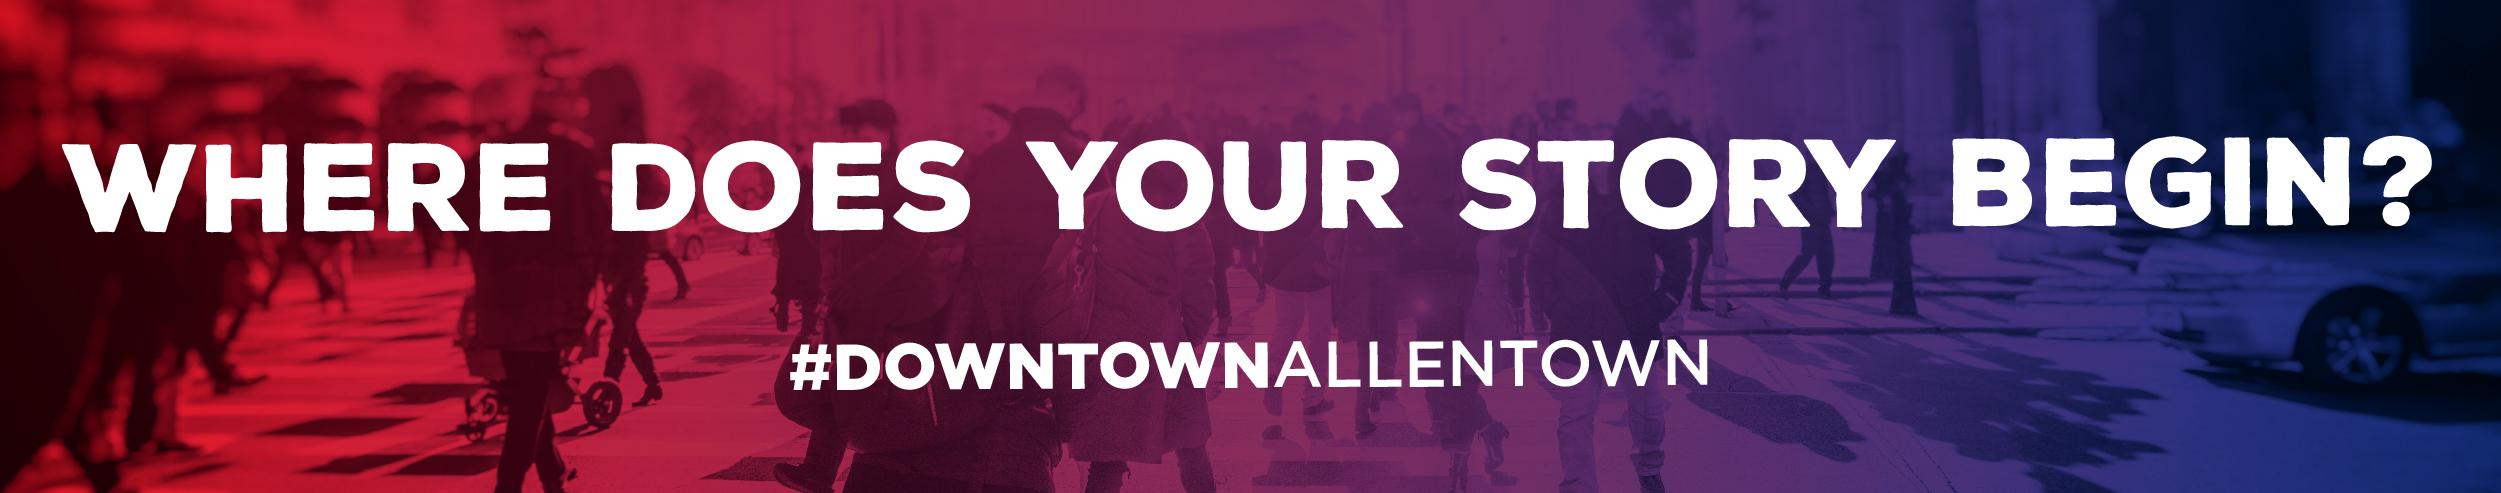 #DowntownAllentown